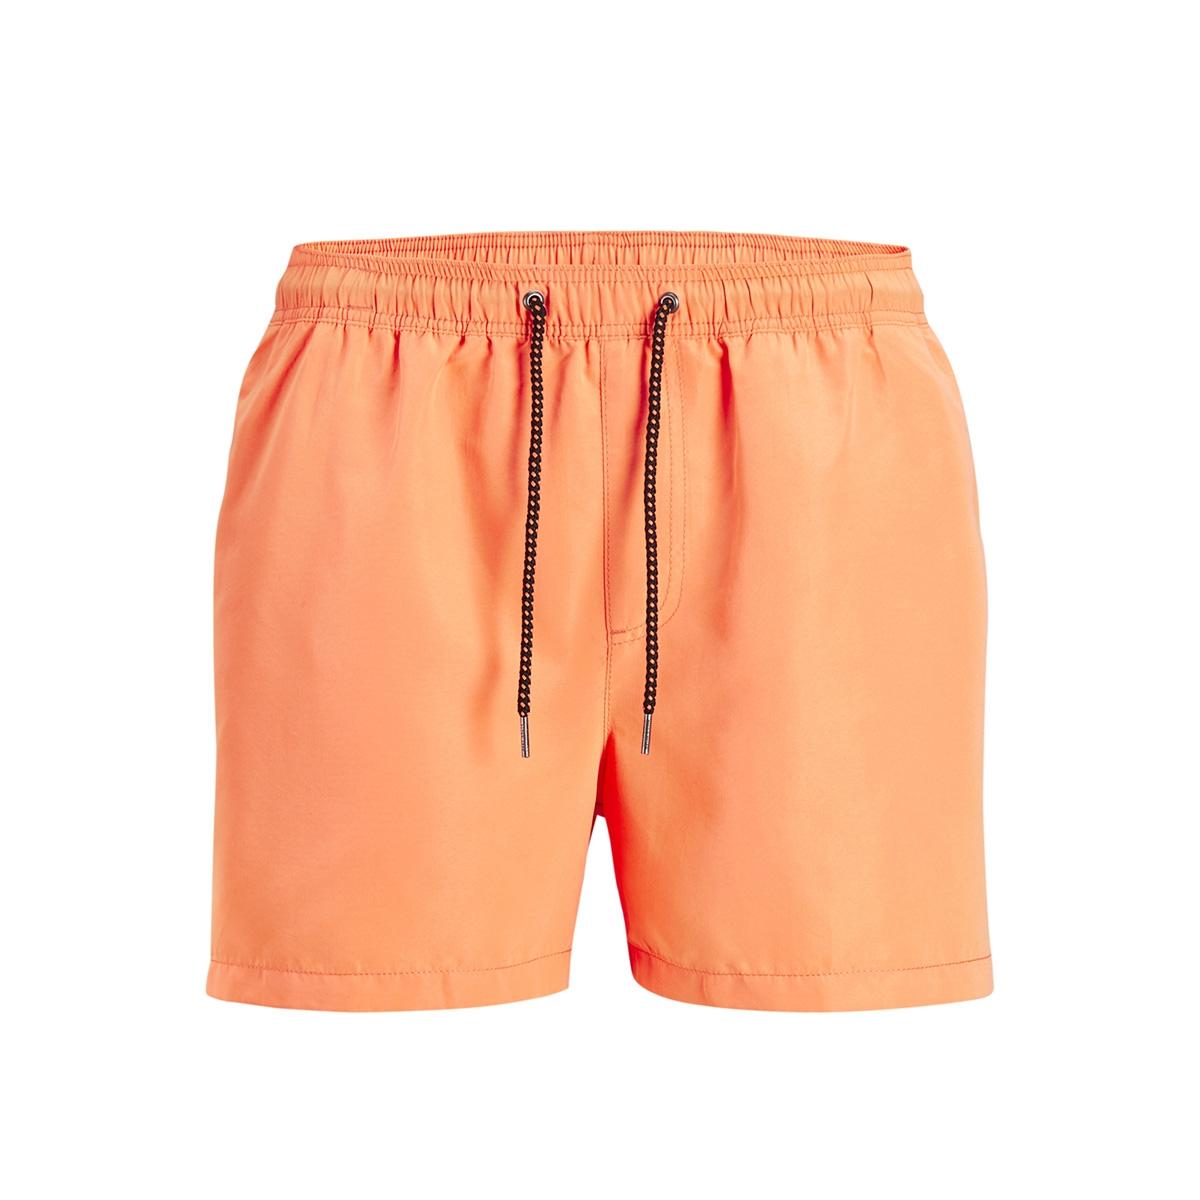 jjisunset swim shorts akm noos 12133191 jack & jones sport short nectarine